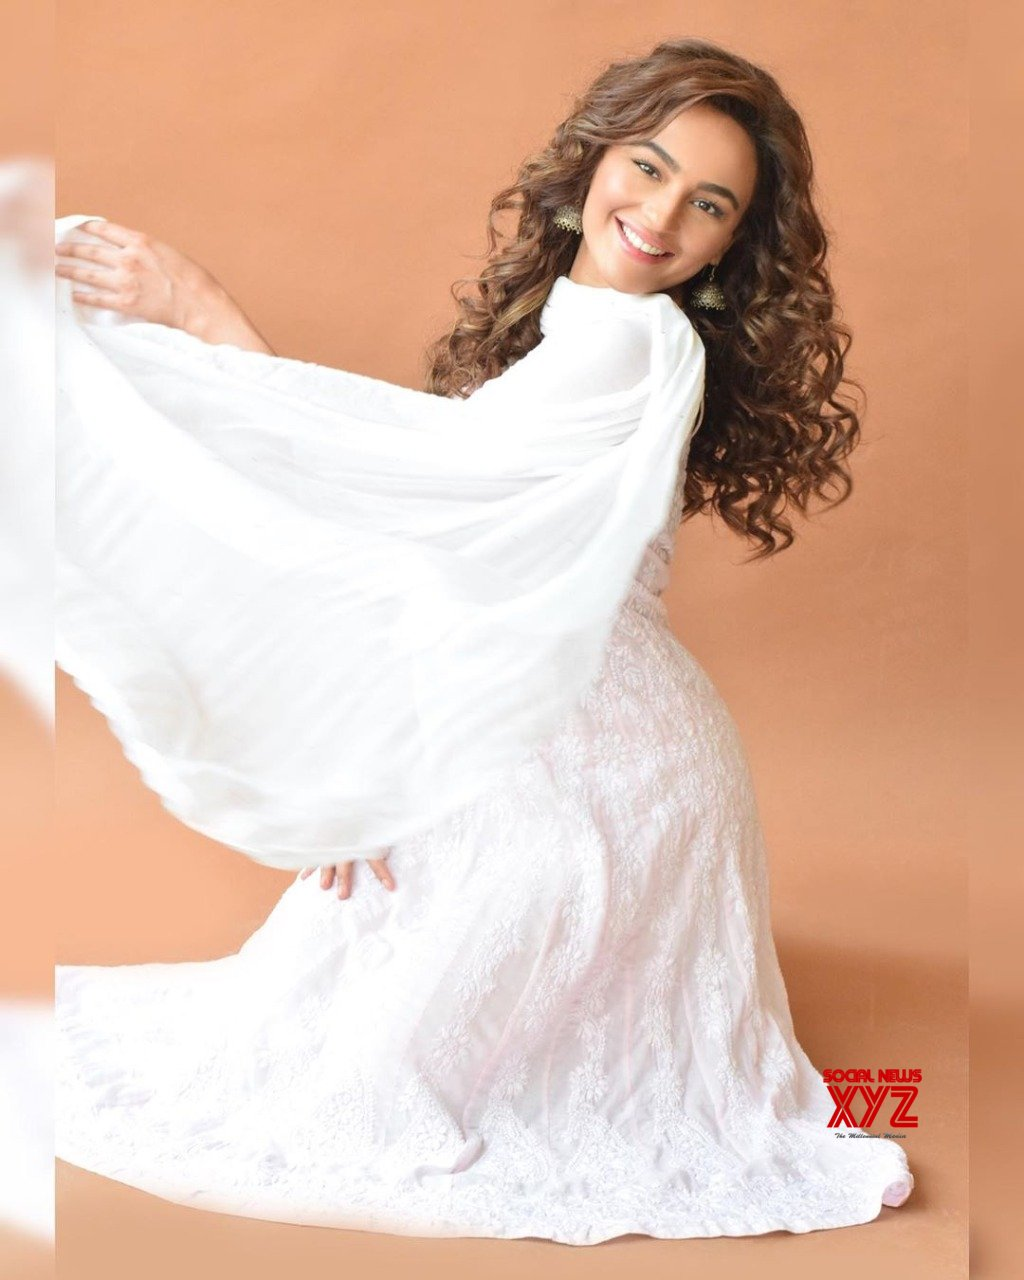 Seerat Kapoor Wishes Everyone Happy Janmashtami Social News Xyz